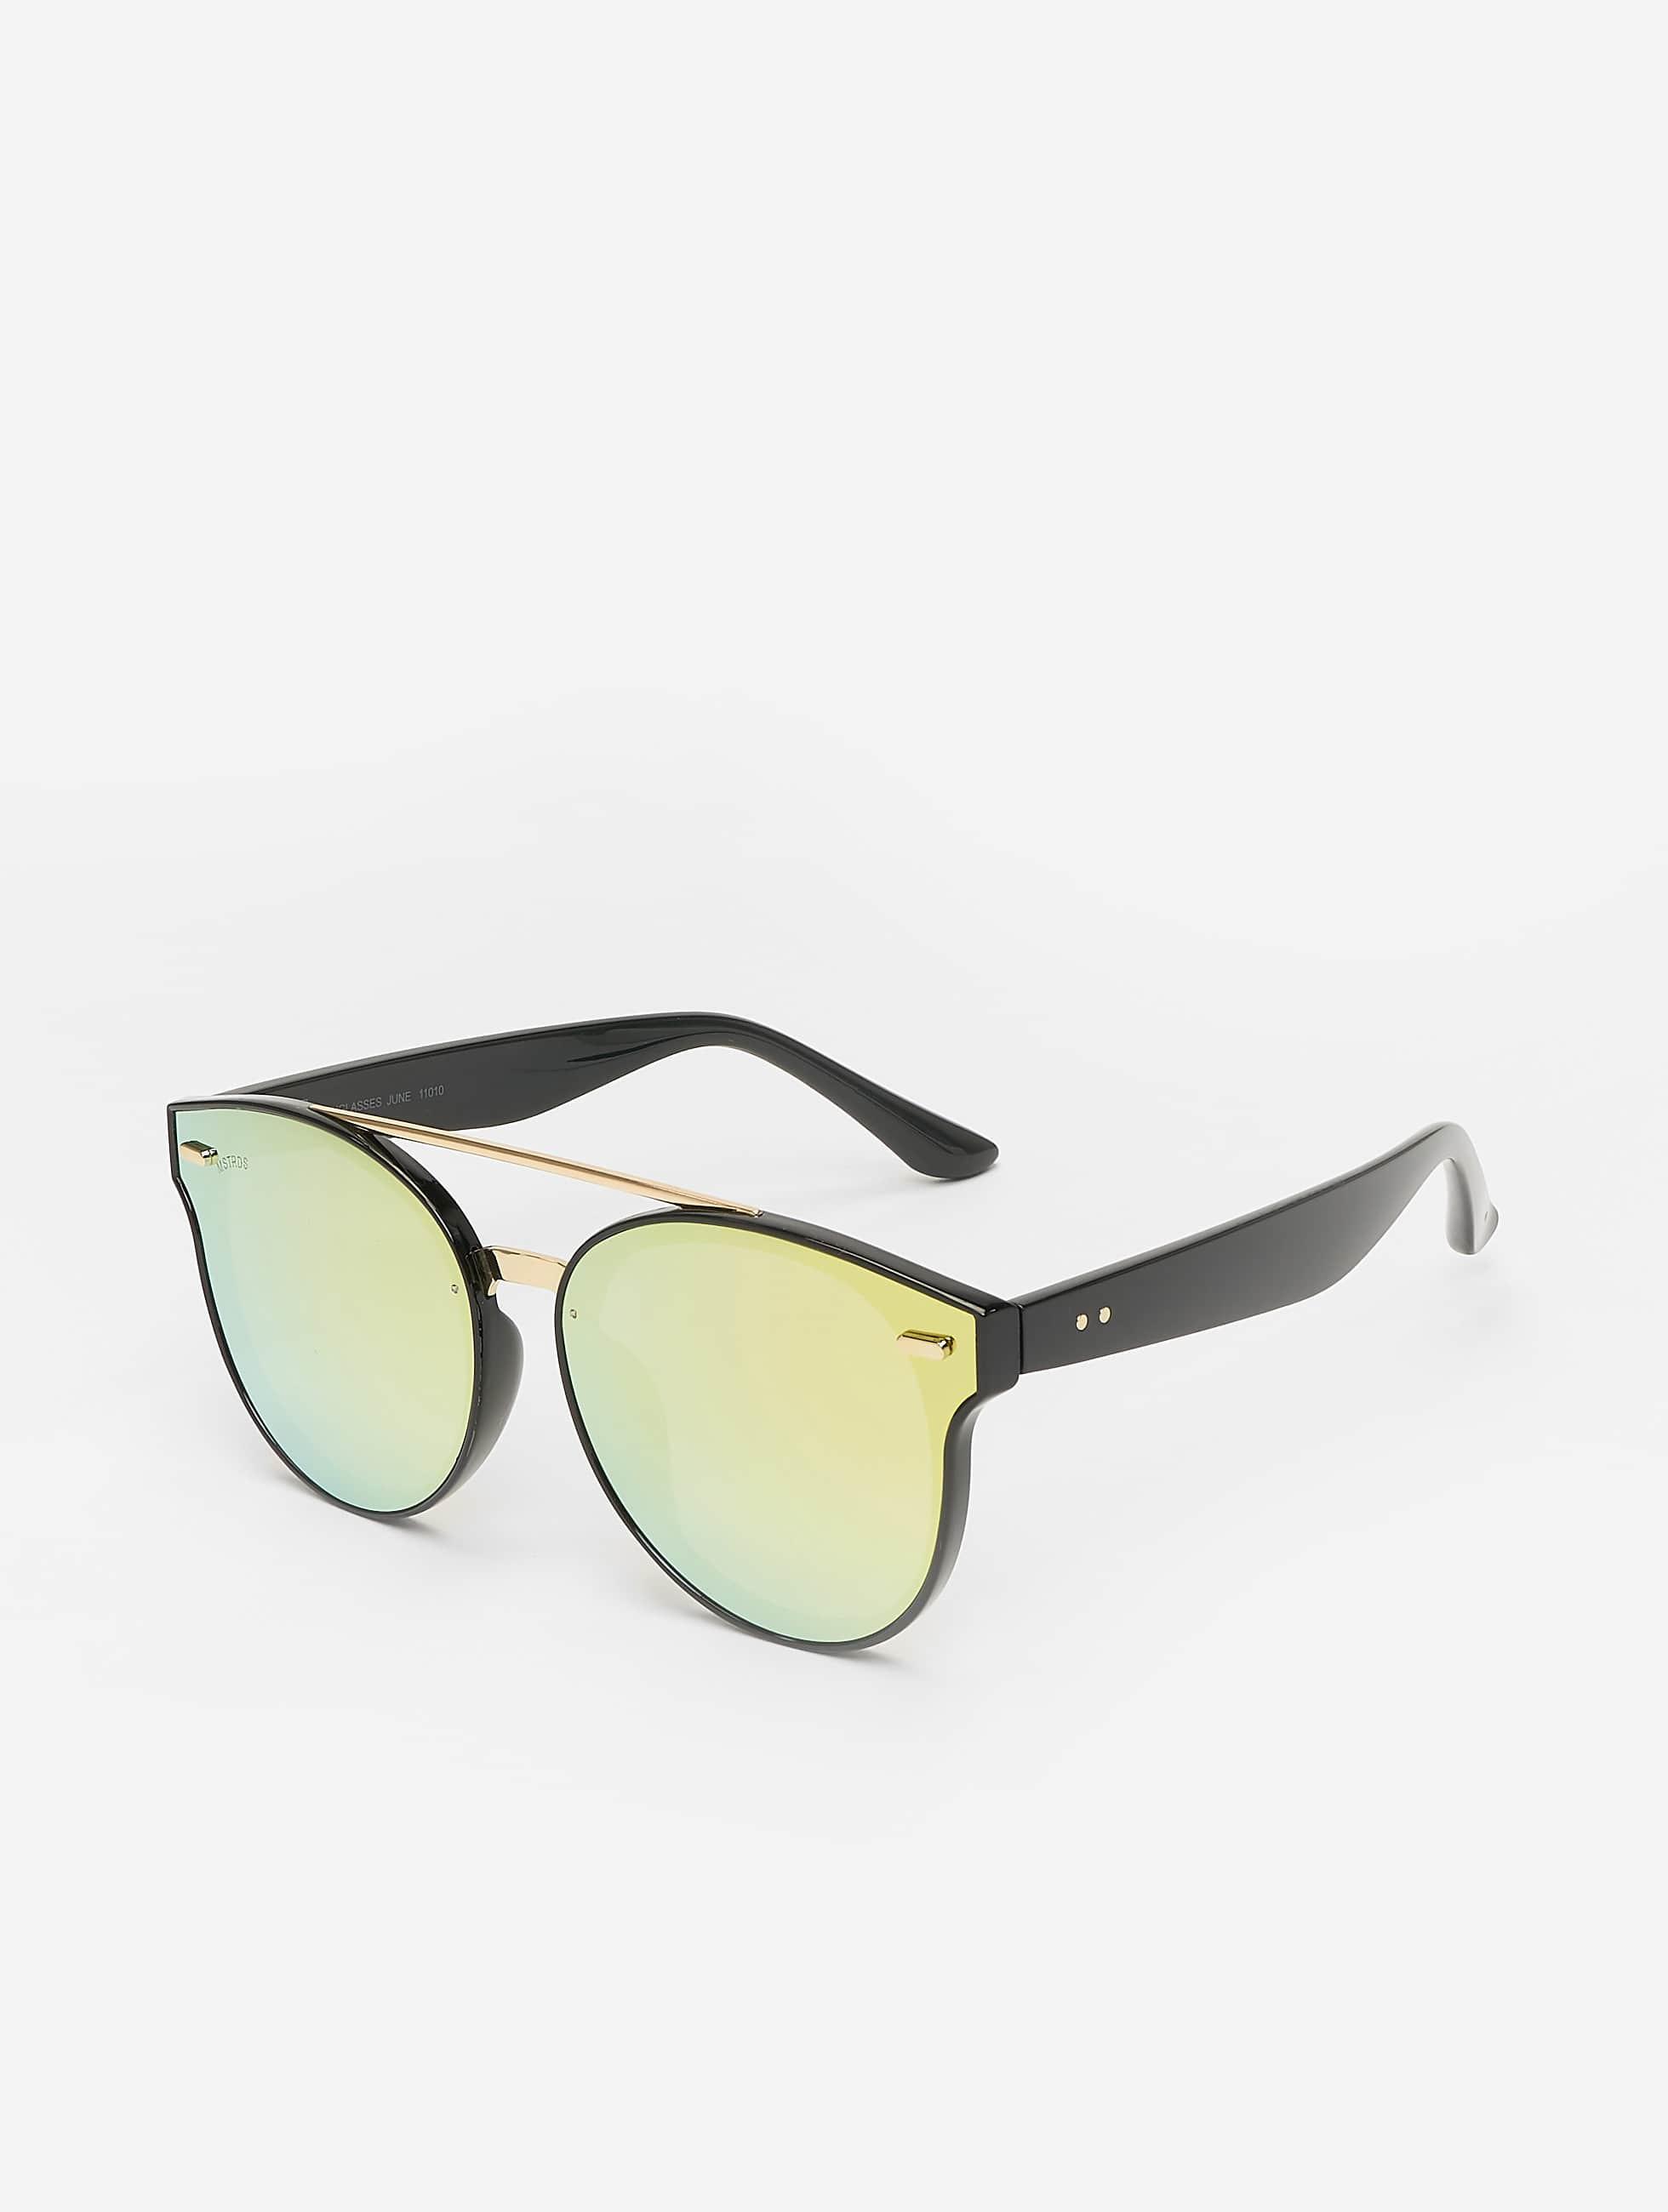 MSTRDS June Sunglasses BlackGolden